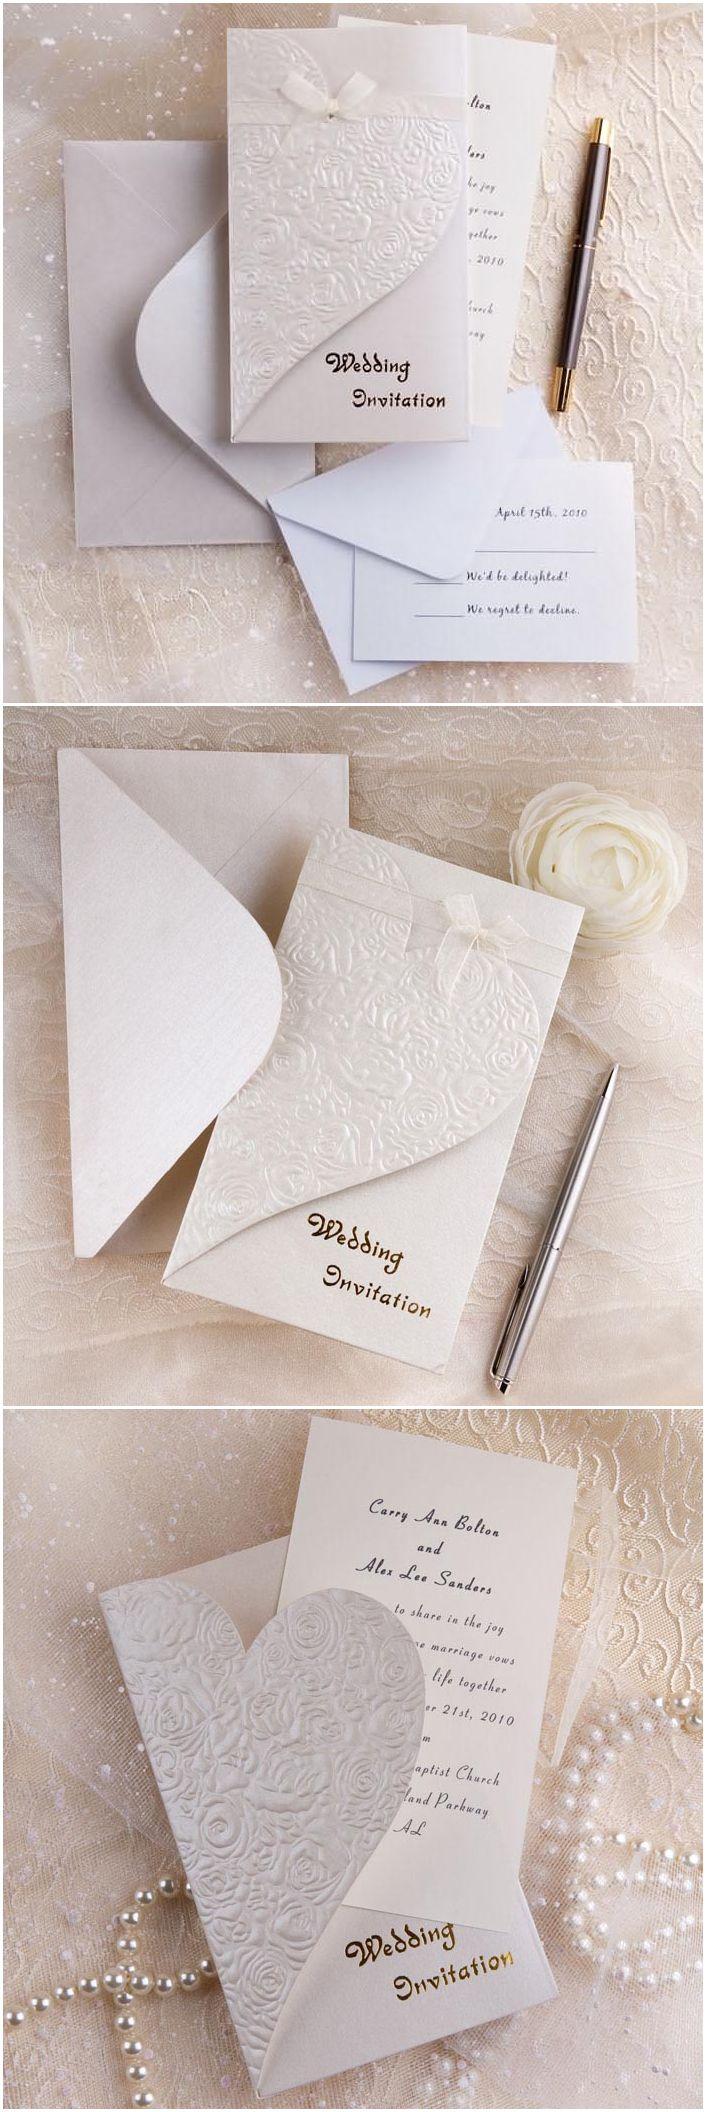 427 Best Carte Images On Pinterest Bridal Invitations Invitation